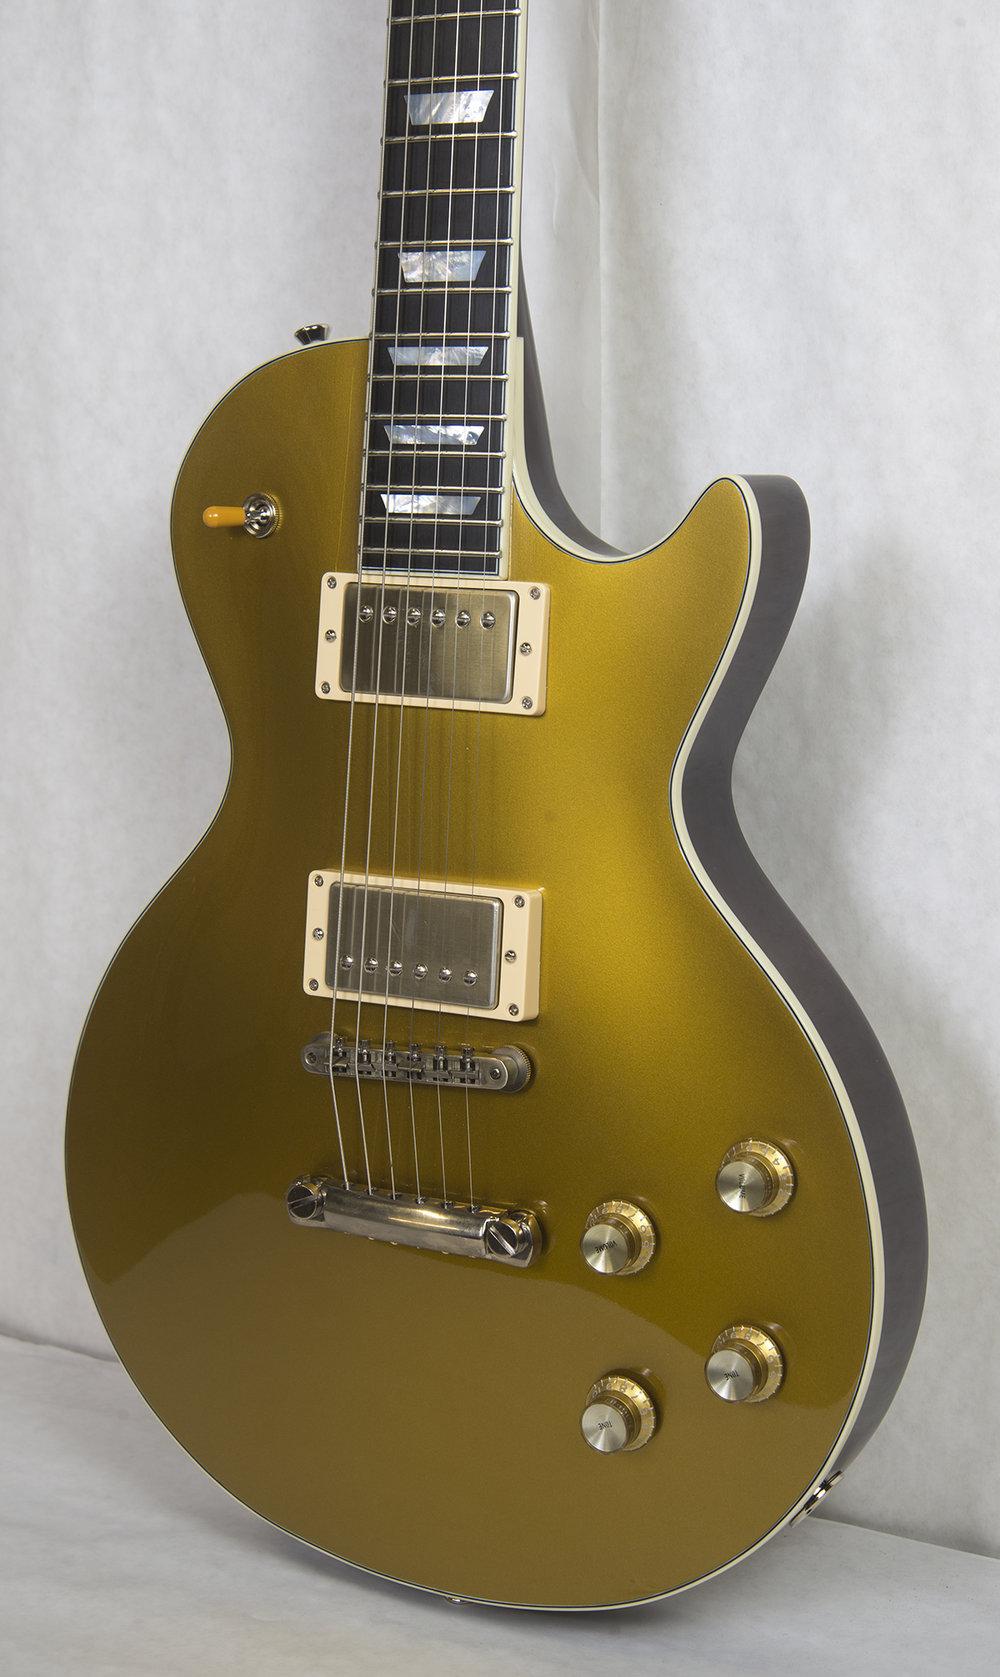 Gold Top PalusMourn LA Vintage Body Angle #1 WEB.jpg